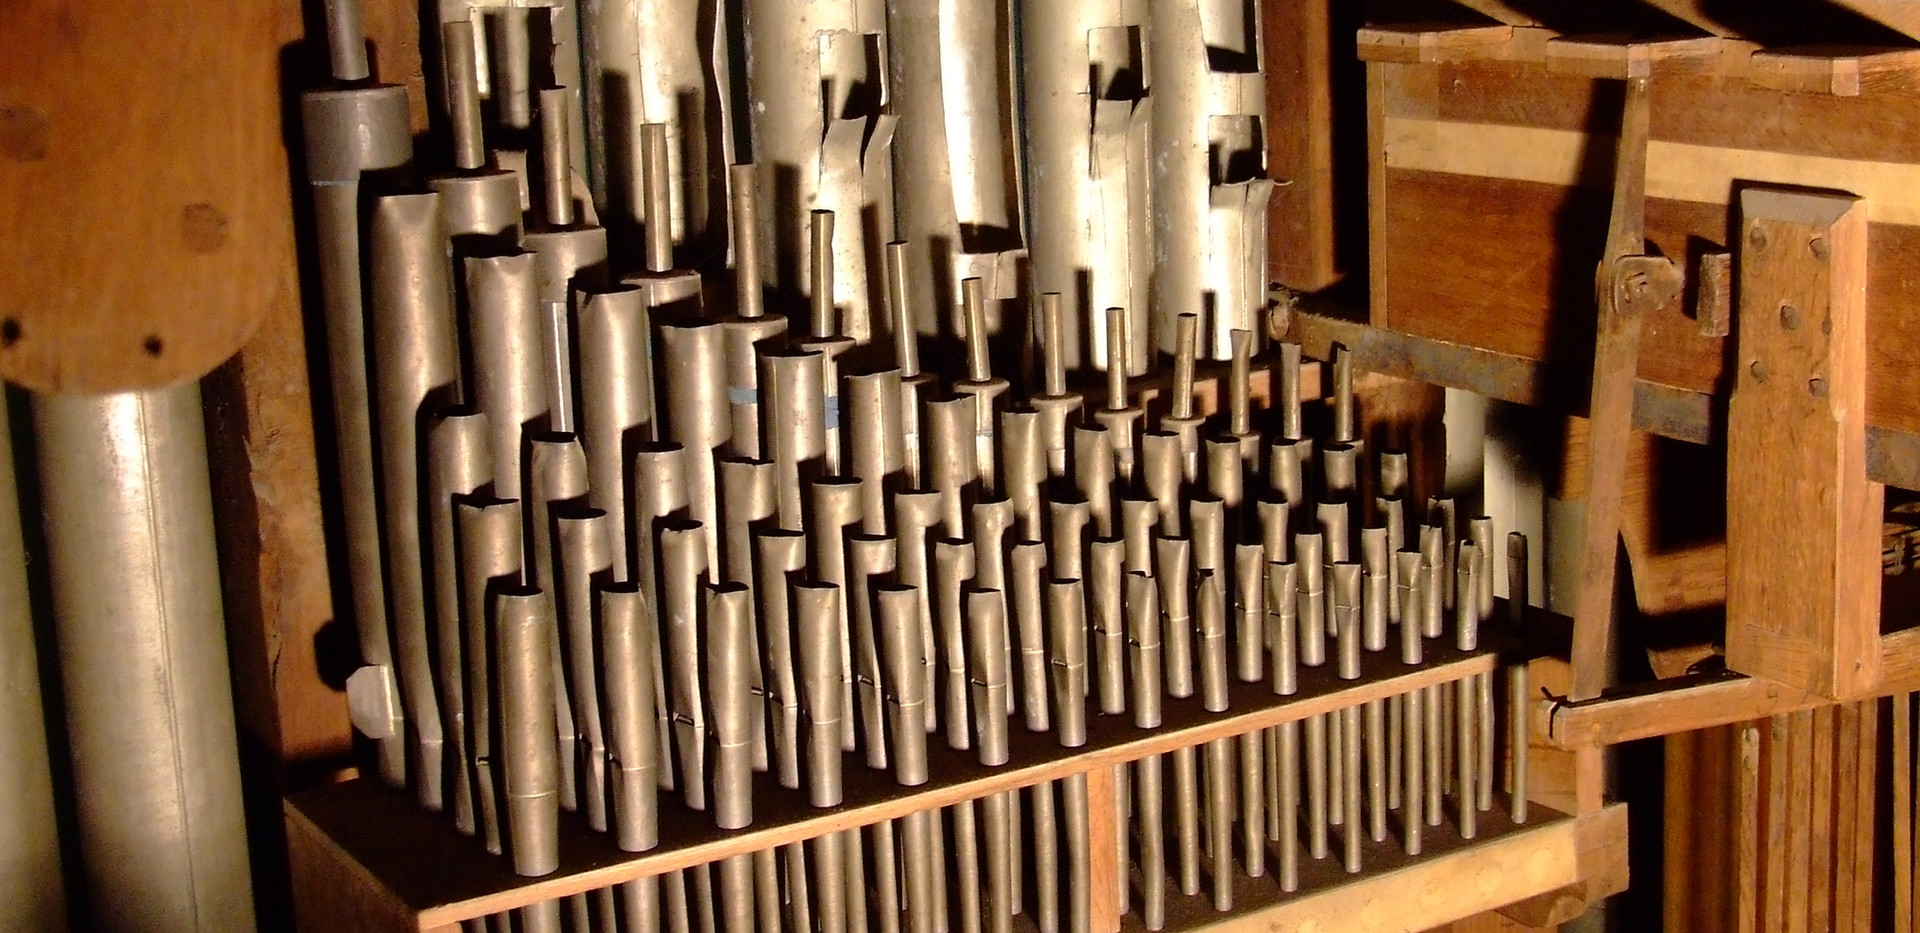 Cornet 5 rangs du Grand orgue